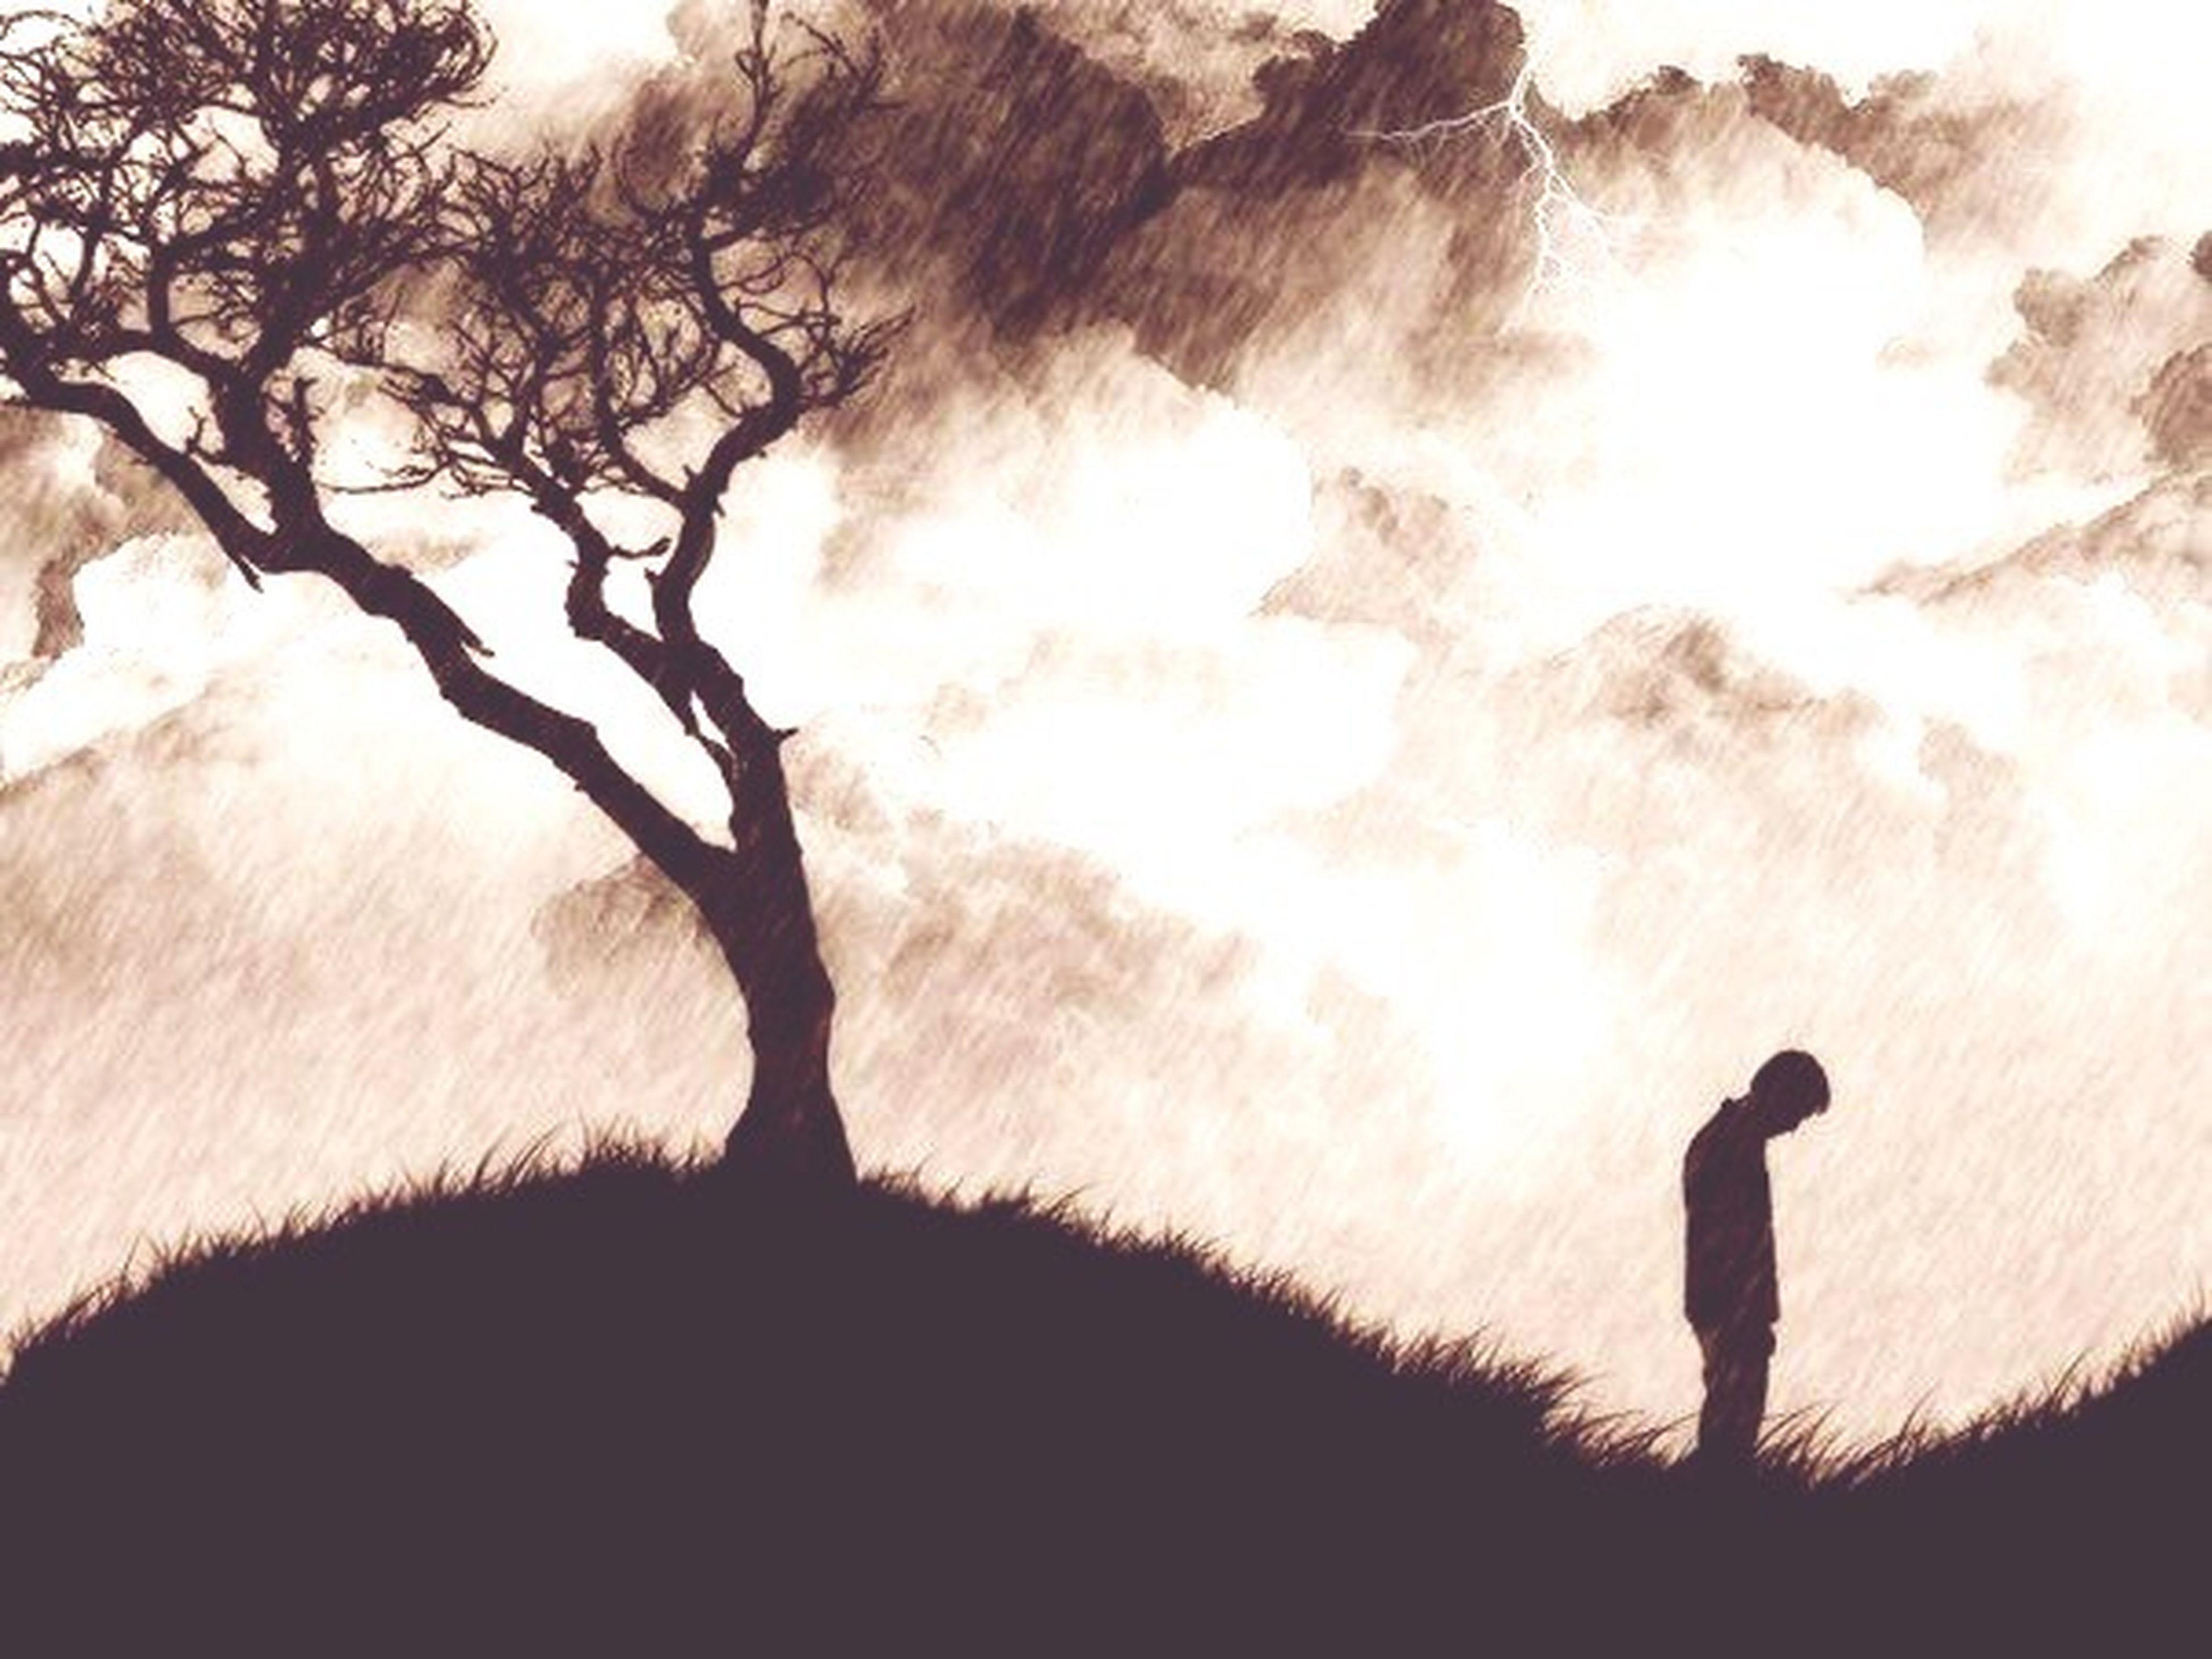 silhouette, sun, sunlight, tree, sunset, lifestyles, sunbeam, standing, full length, men, leisure activity, tranquility, nature, lens flare, bare tree, walking, landscape, tranquil scene